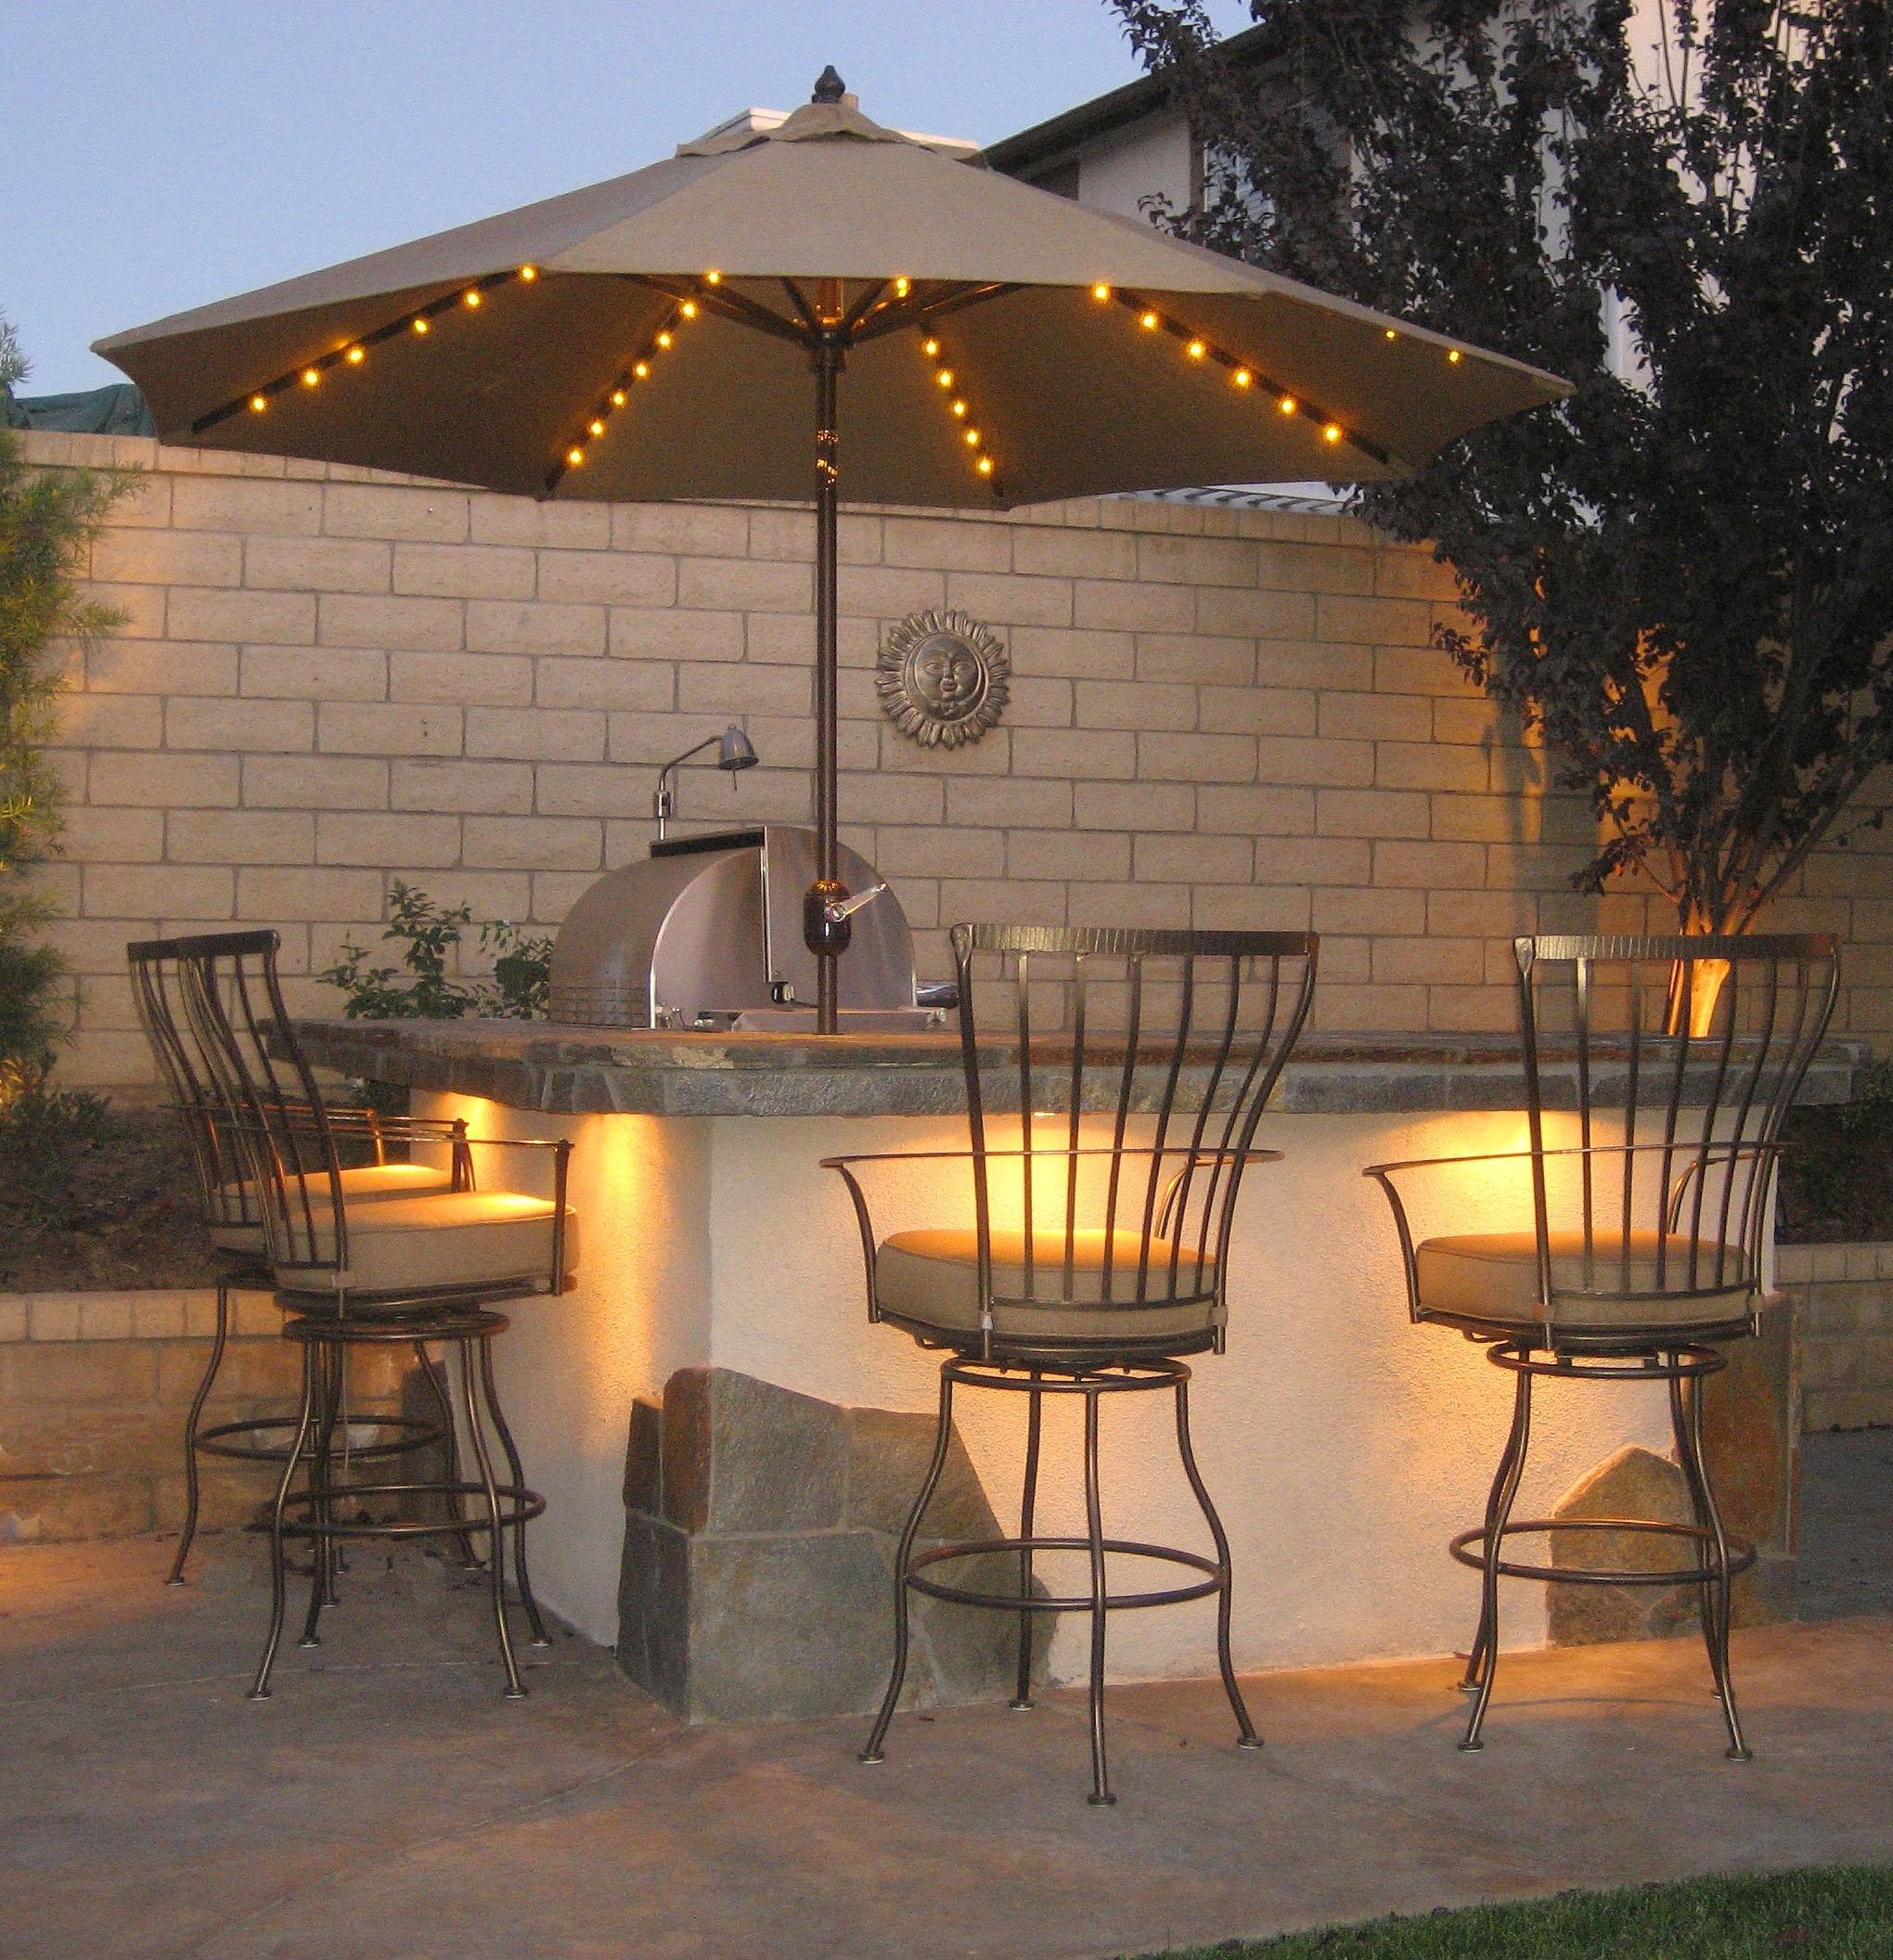 Patio Umbrellas With Solar Lights Inside Latest Solar Patio Umbrella – Home Design Ideas (View 5 of 20)